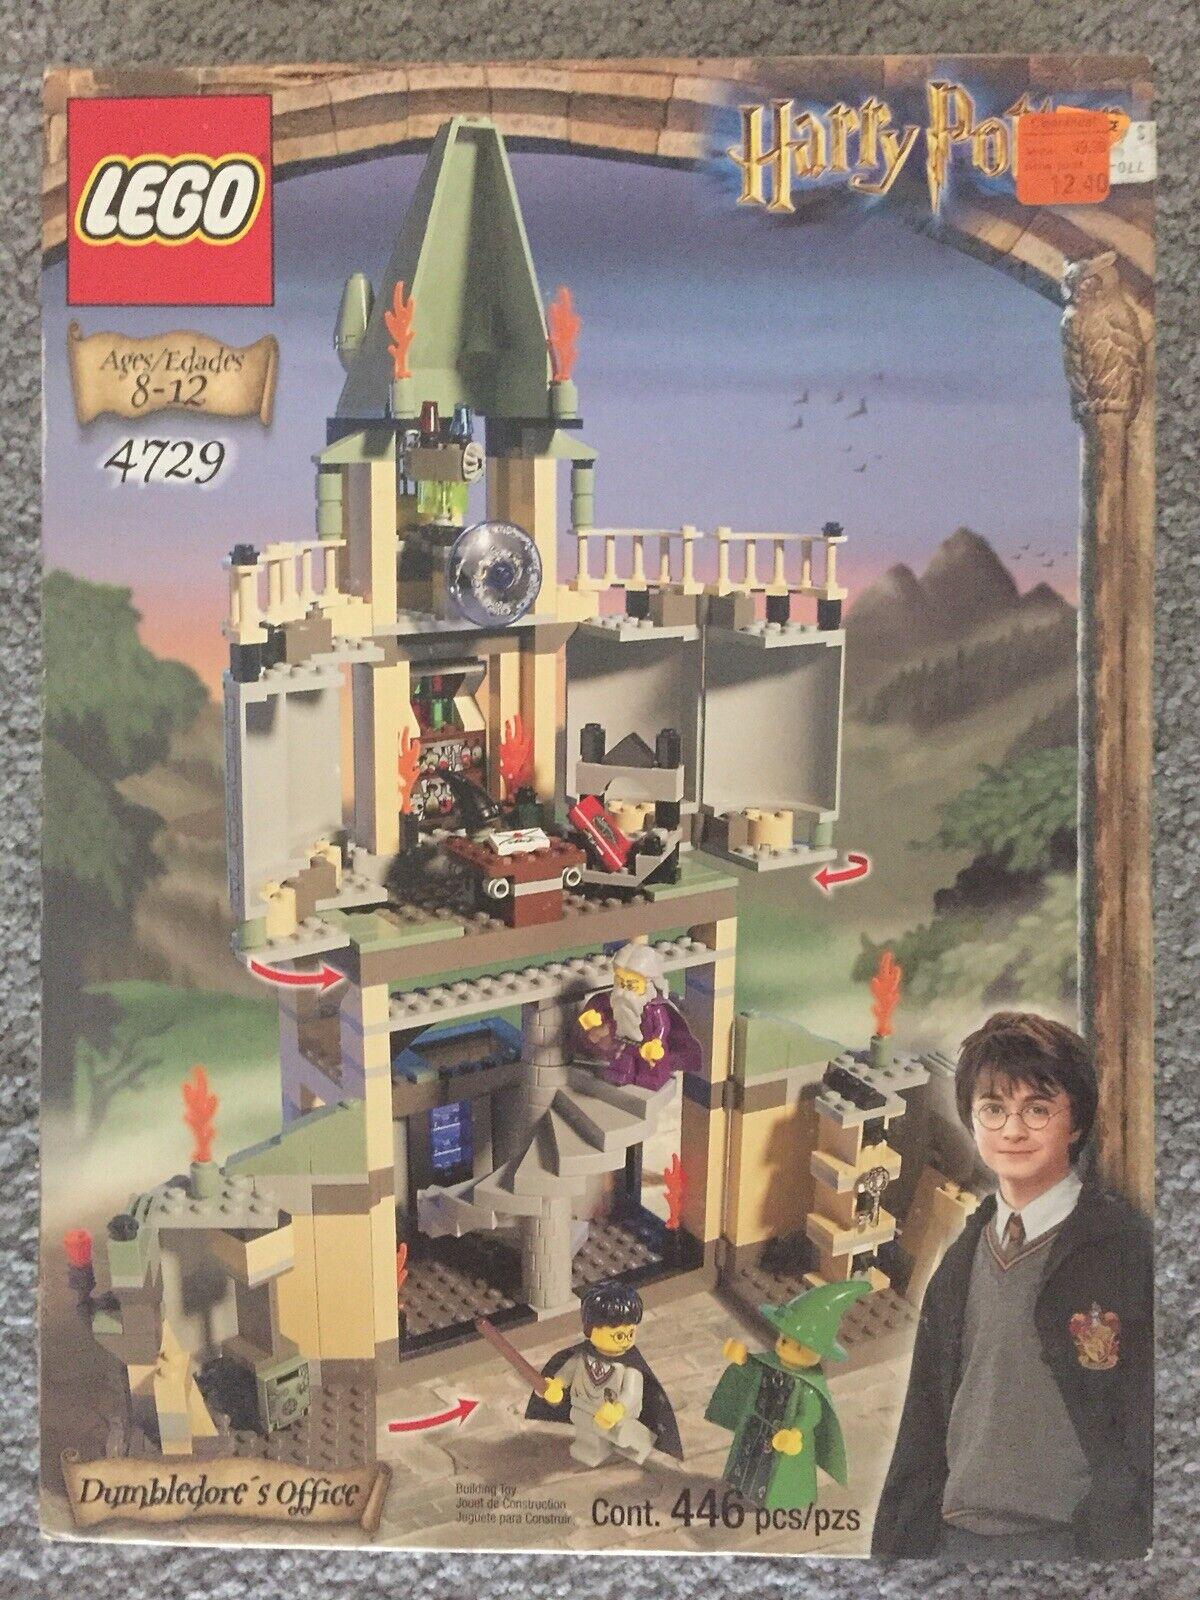 Lego Harry Potter y la piedra mágica 4729 Oficina de Dumbledore